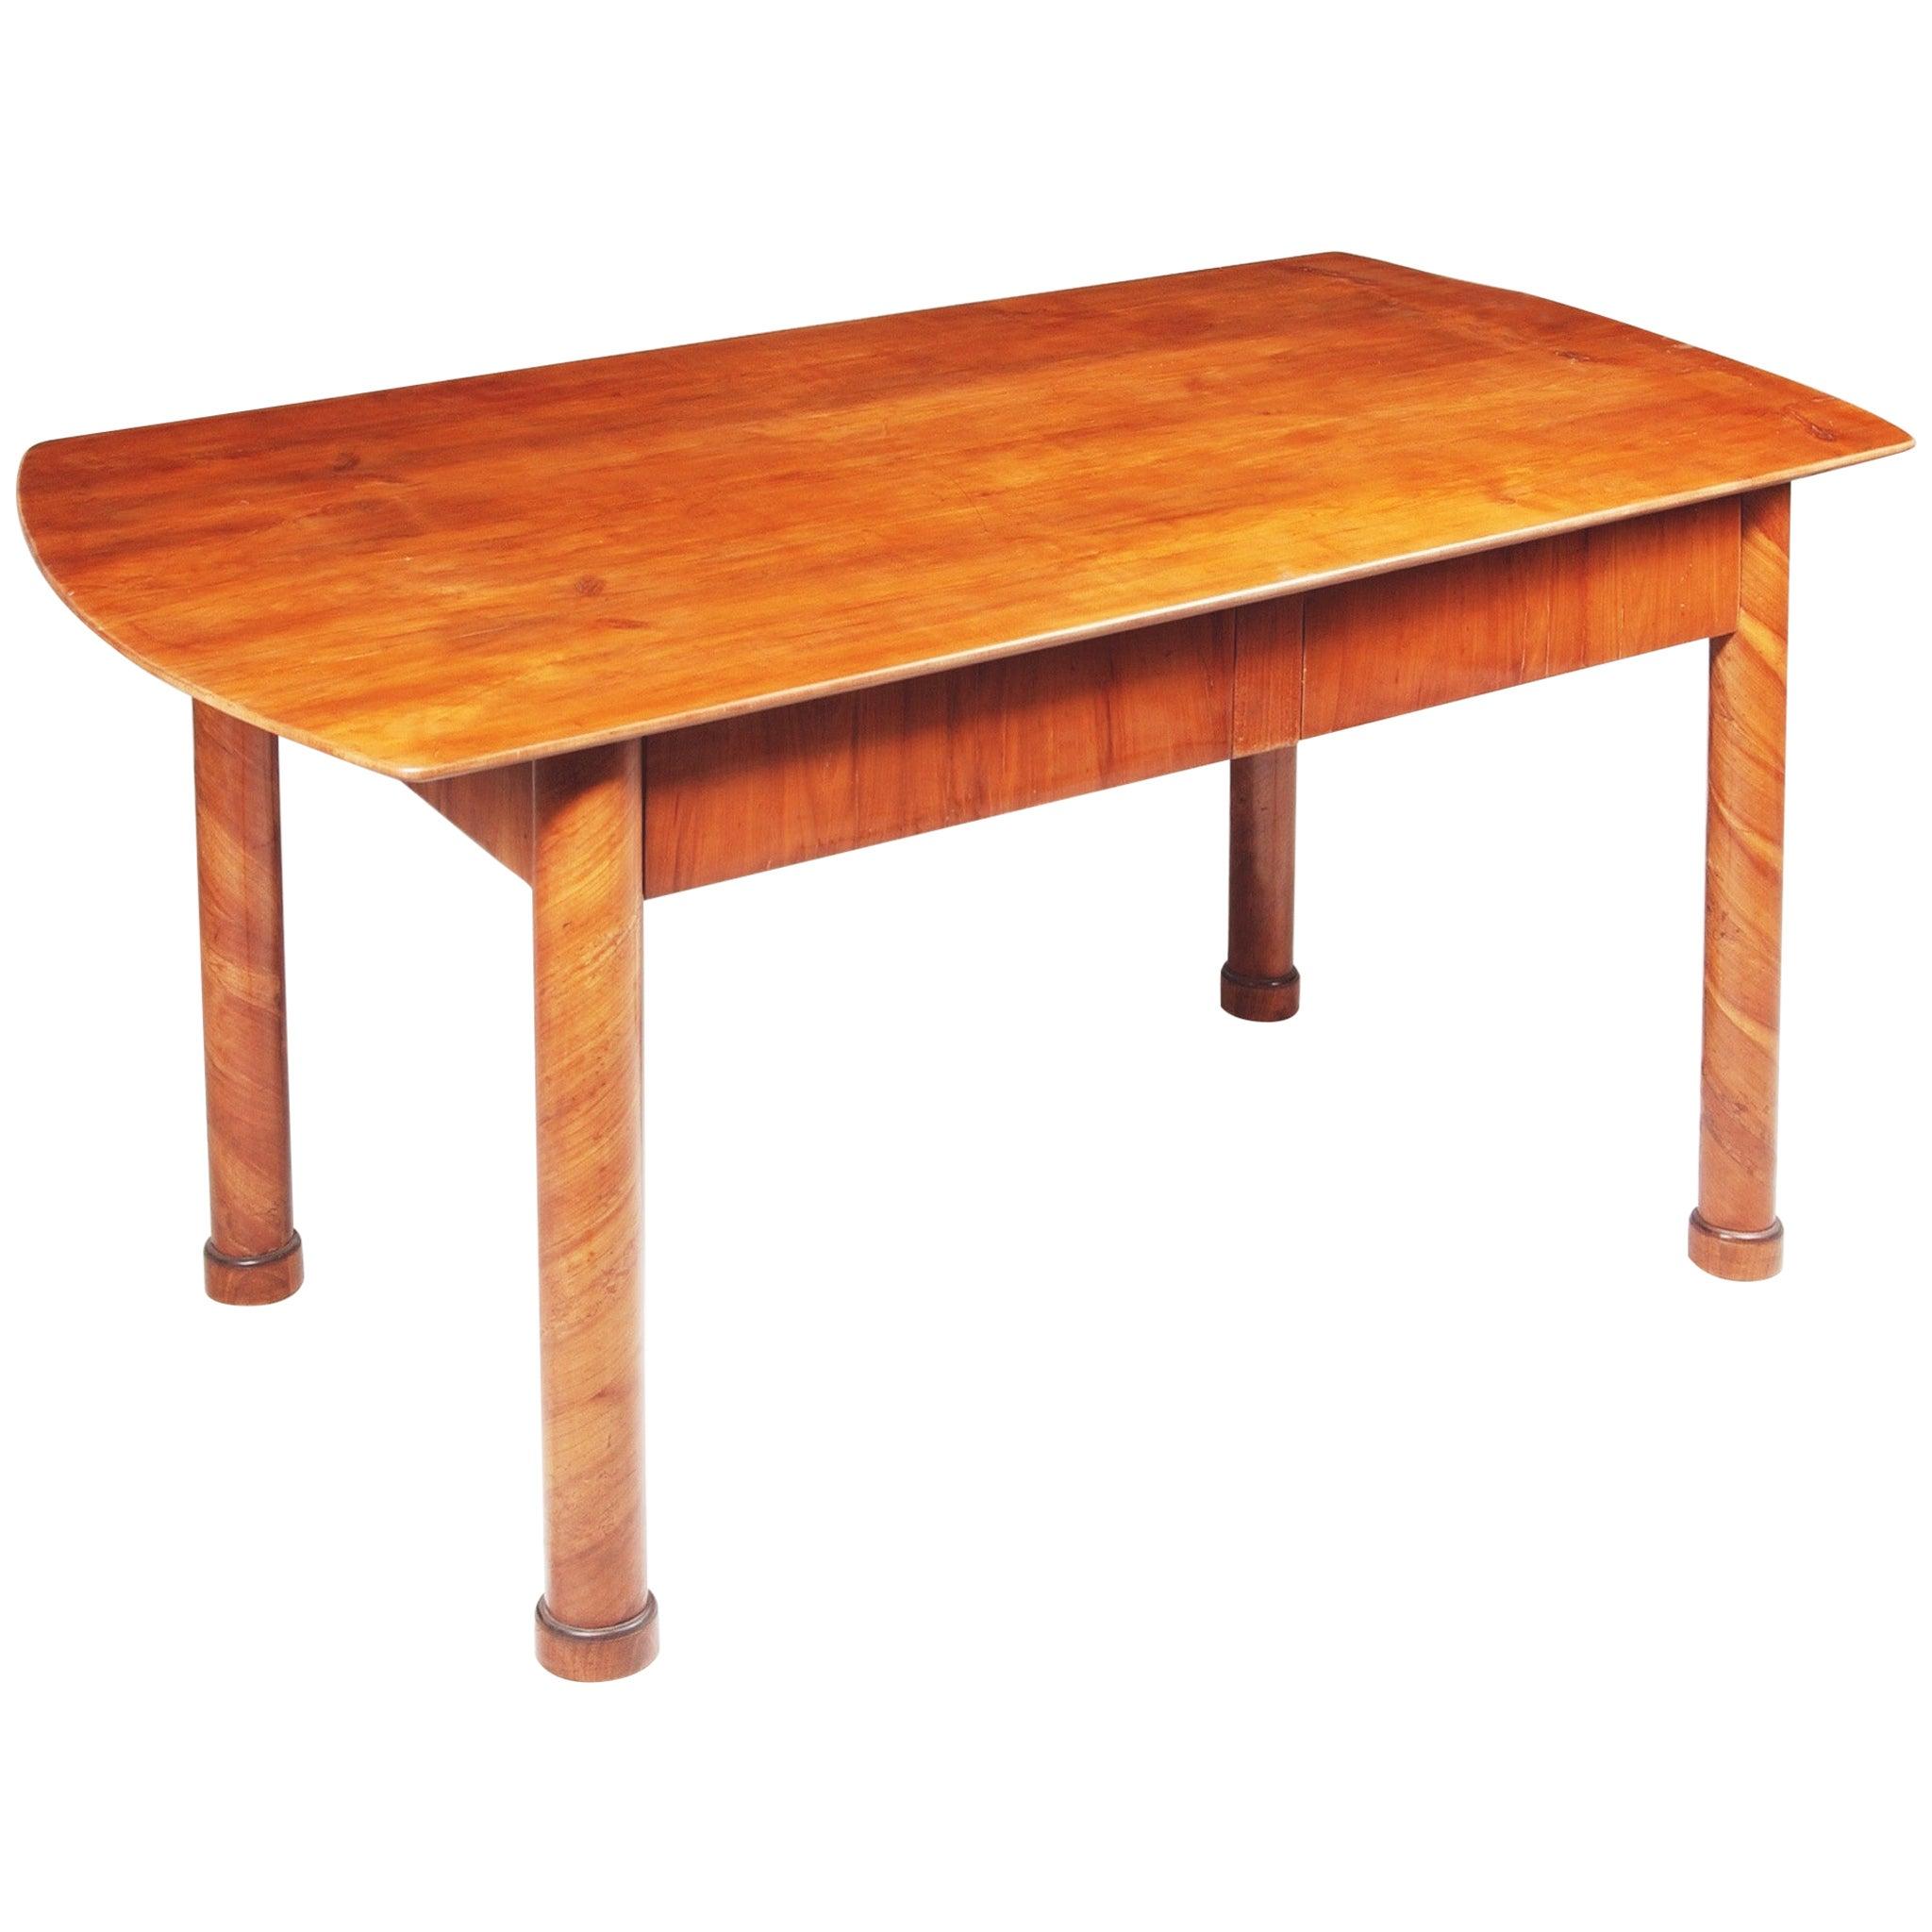 19th Century Restored German Biedermeier Cherry-Tree Writing Desk, Table, 1830s